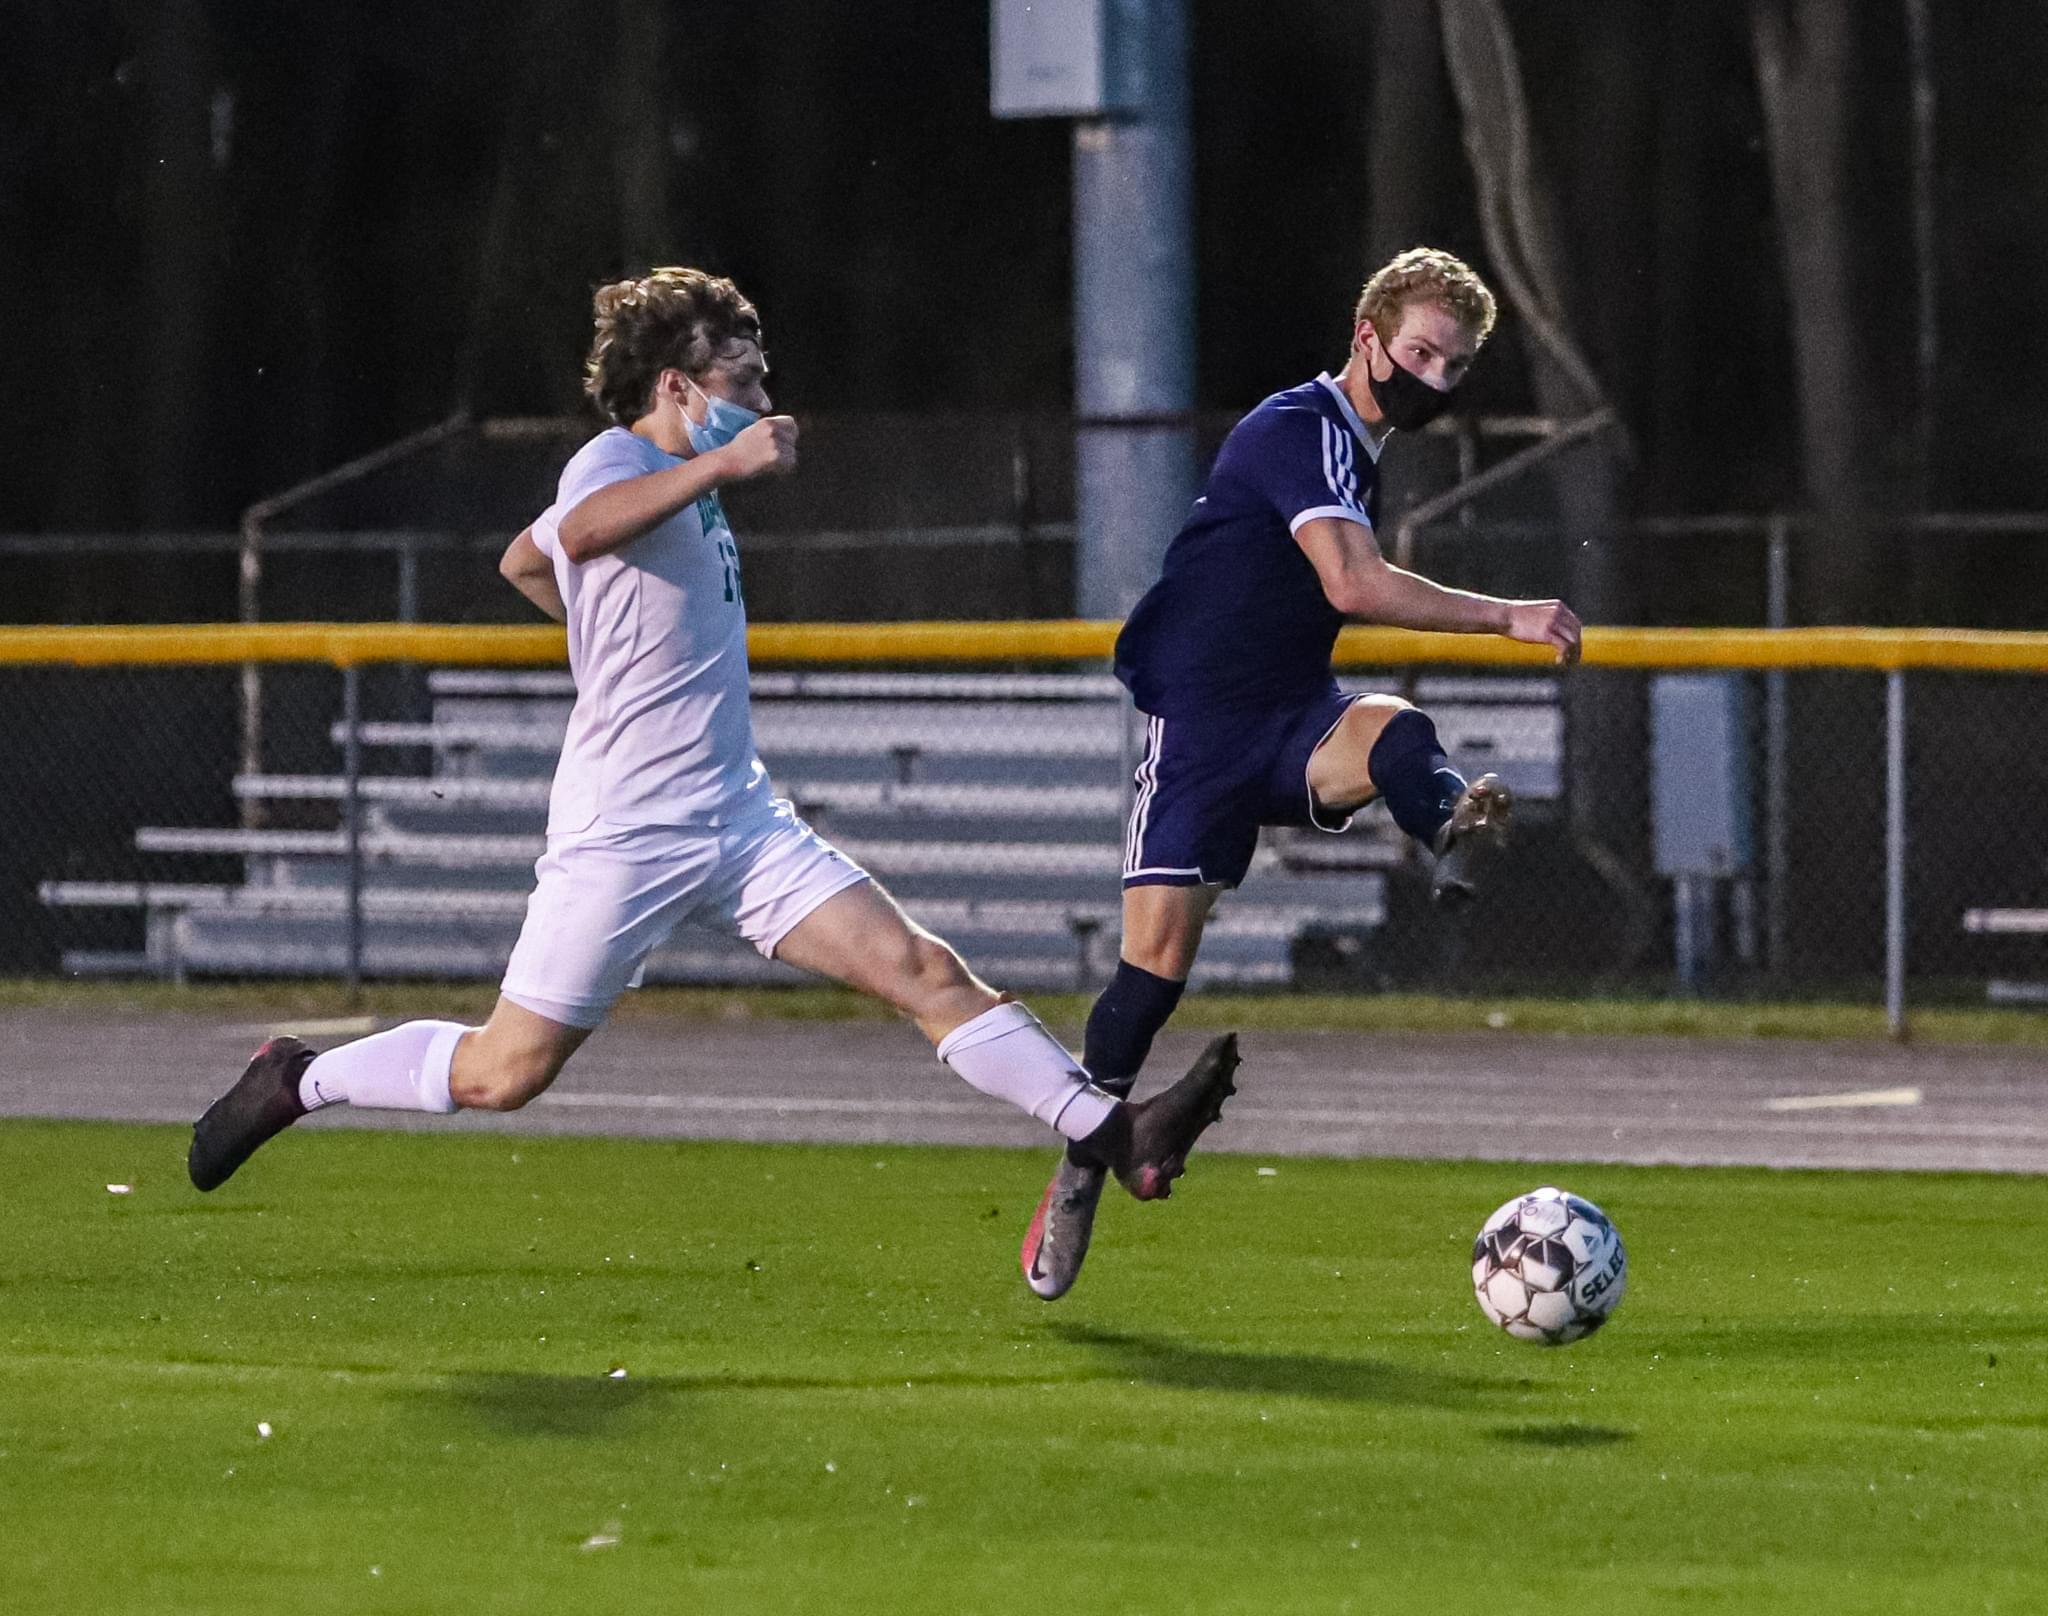 Boys Soccer: J.H. Rose Slips Past C.B. Aycock (PHOTO GALLERY)